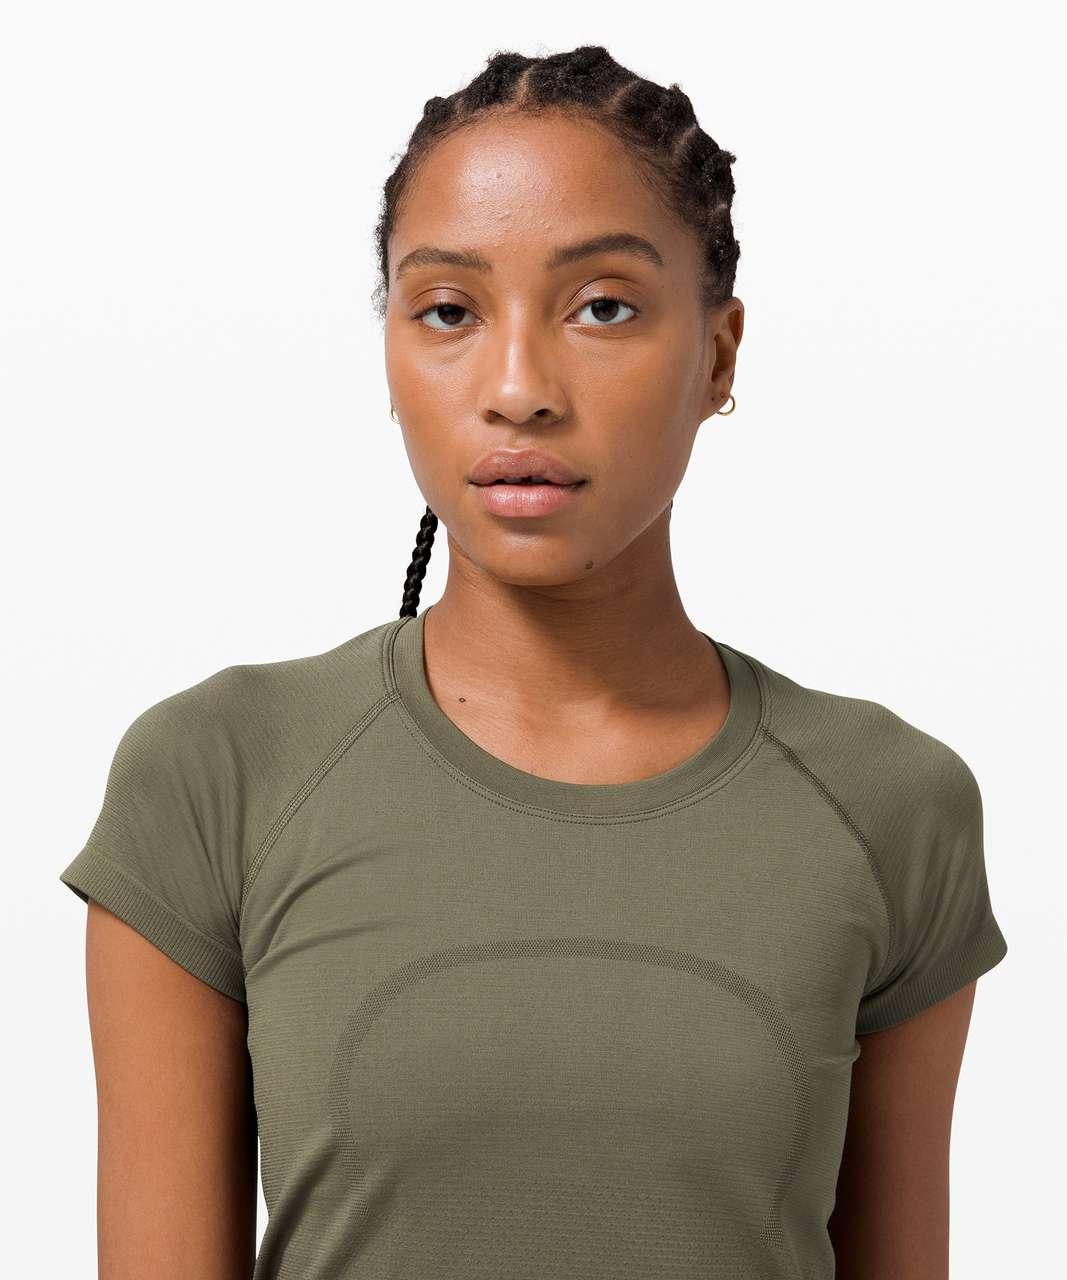 Lululemon Swiftly Tech Short Sleeve 2.0 *Race Length - Army Green / Army Green